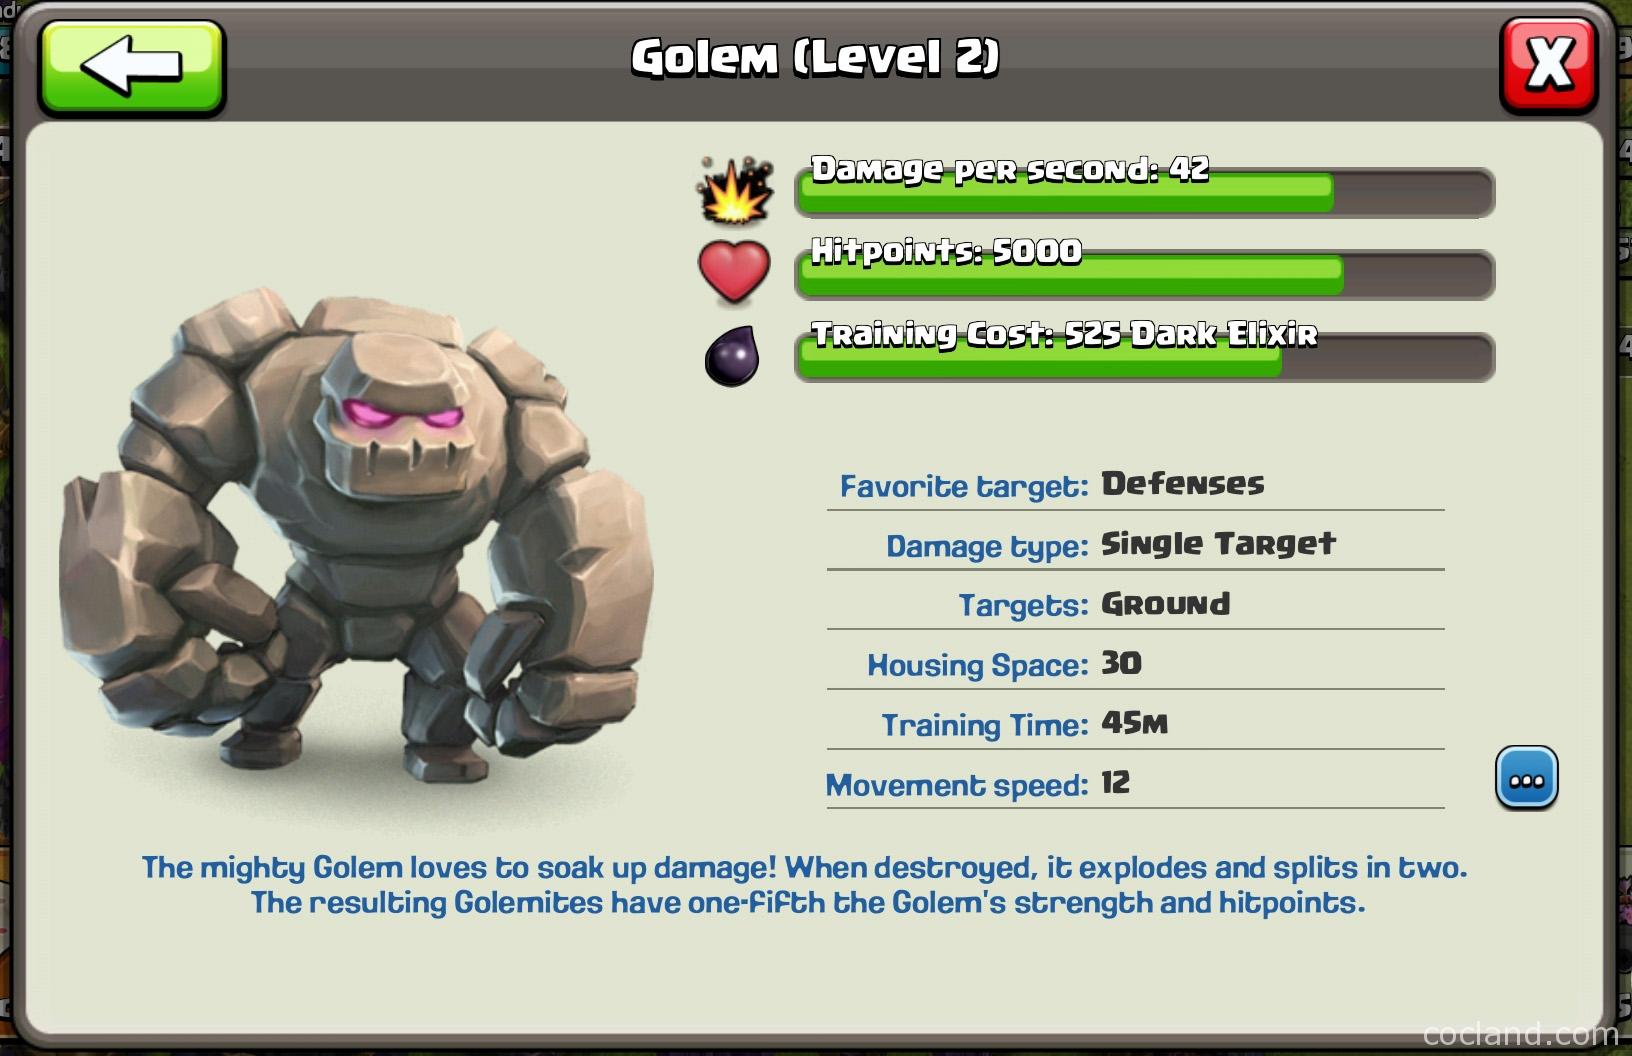 Golem's details